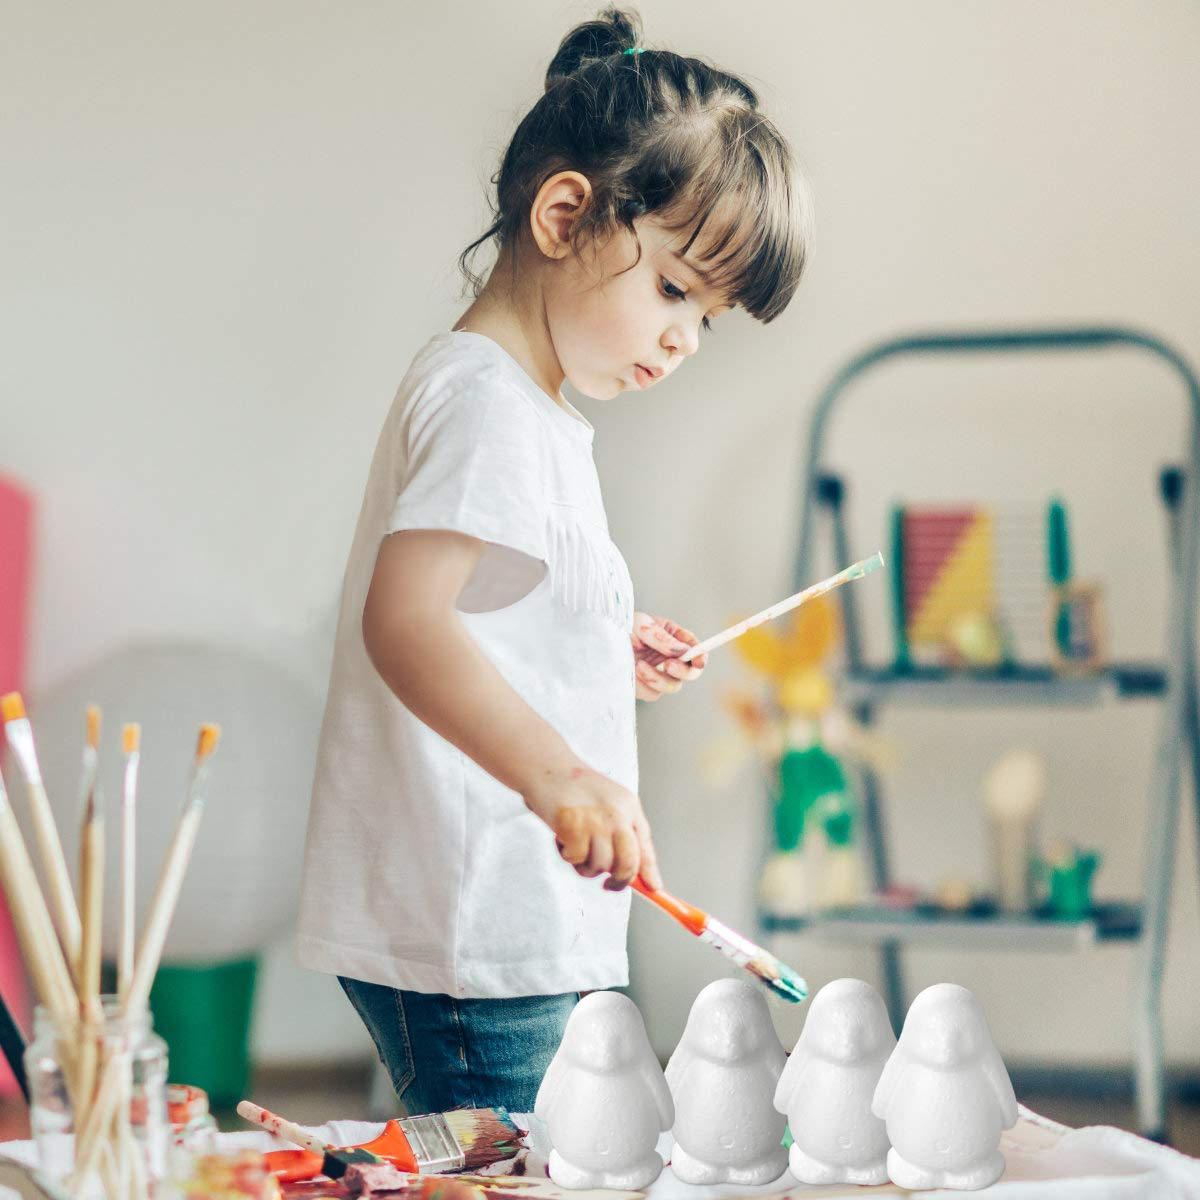 Amosfun 6 St/ück Pinguin Figur Polystyrol Kugeln B/älle Kunst Malerei Modell Modellierung Basteln DIY Handwerk f/ür Kinder Wei/ß